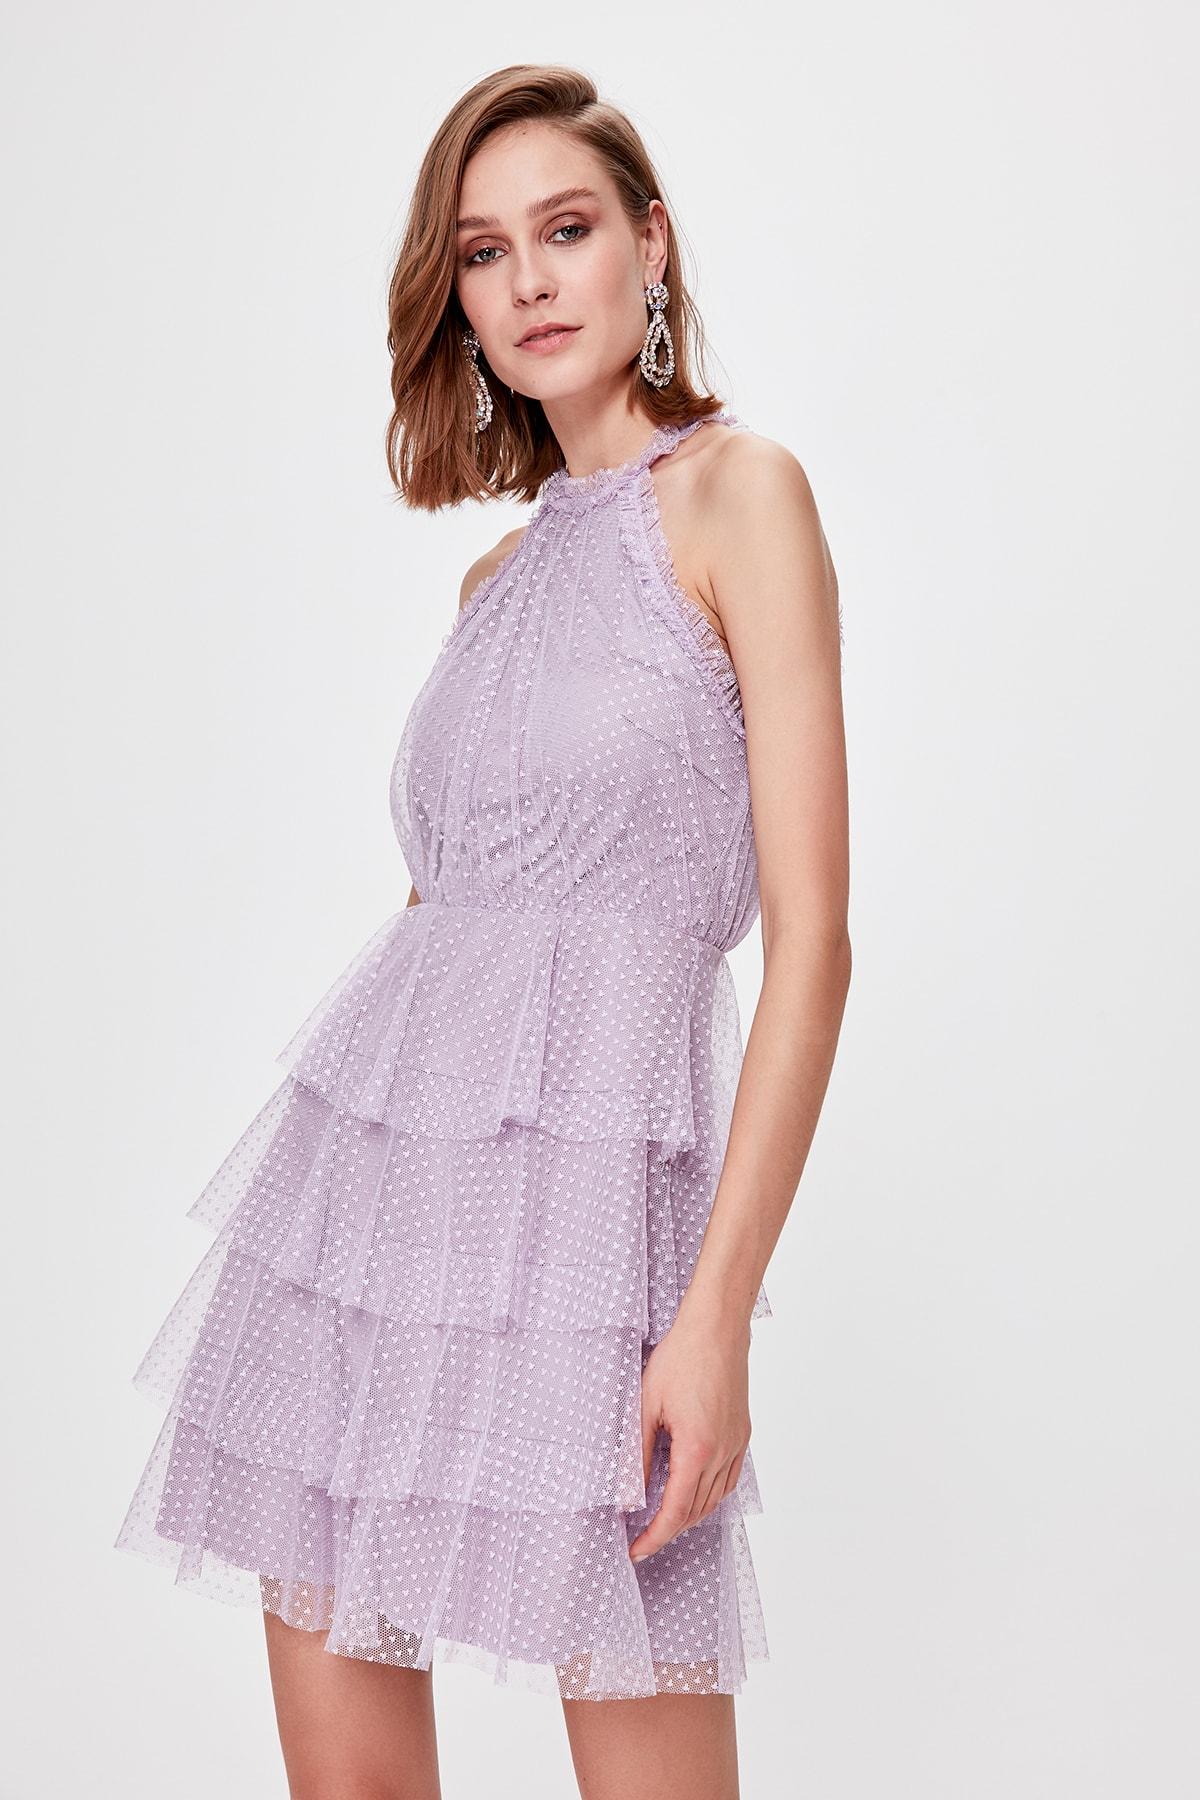 Trendyol Polka Dot Tulle Detailed Dress TPRSS20EL0357